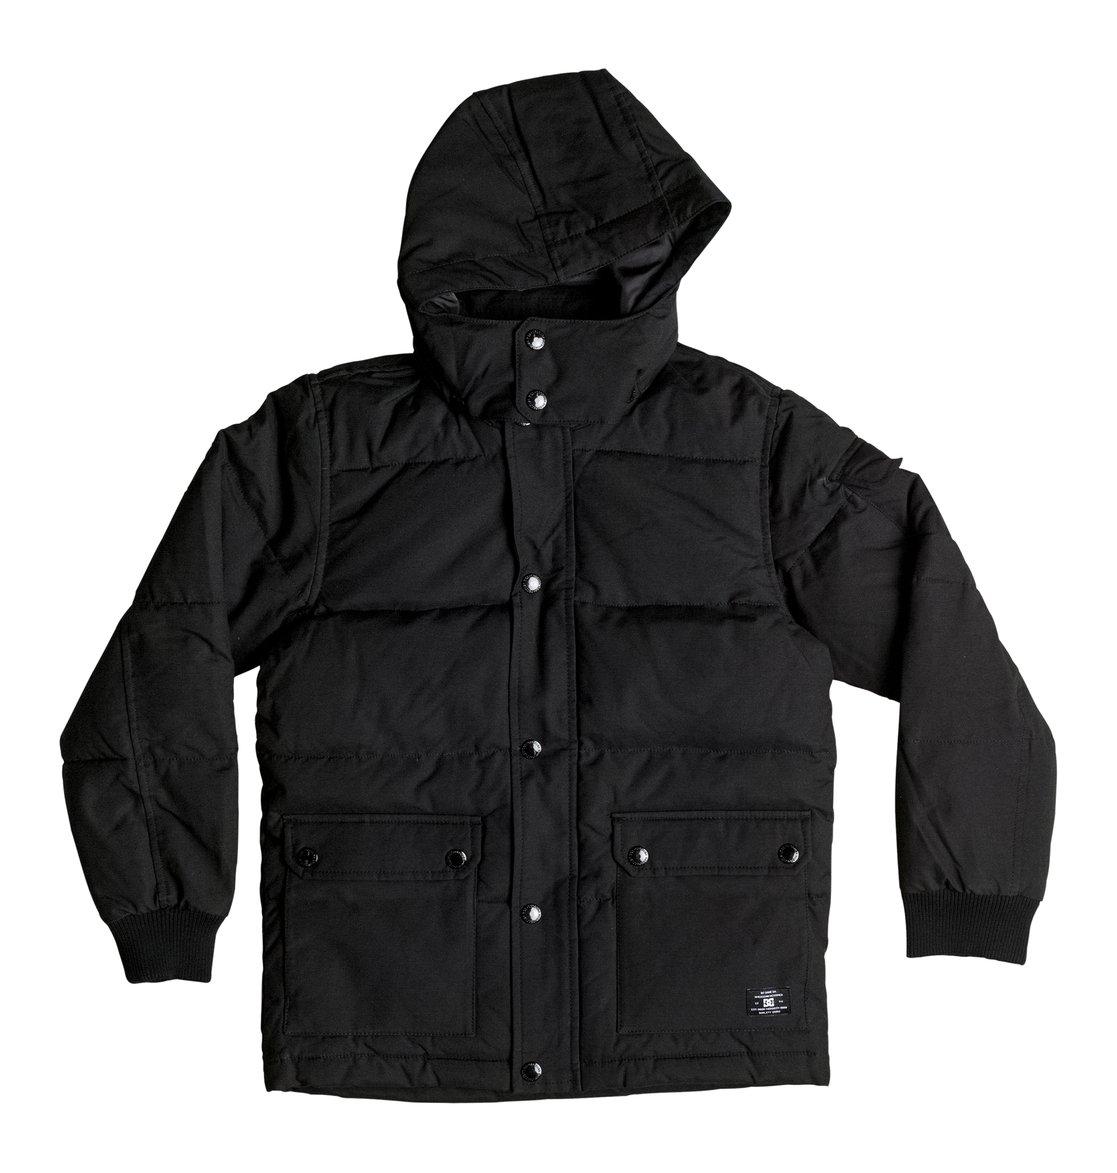 Куртка с утеплителем Arctic от DC Shoes